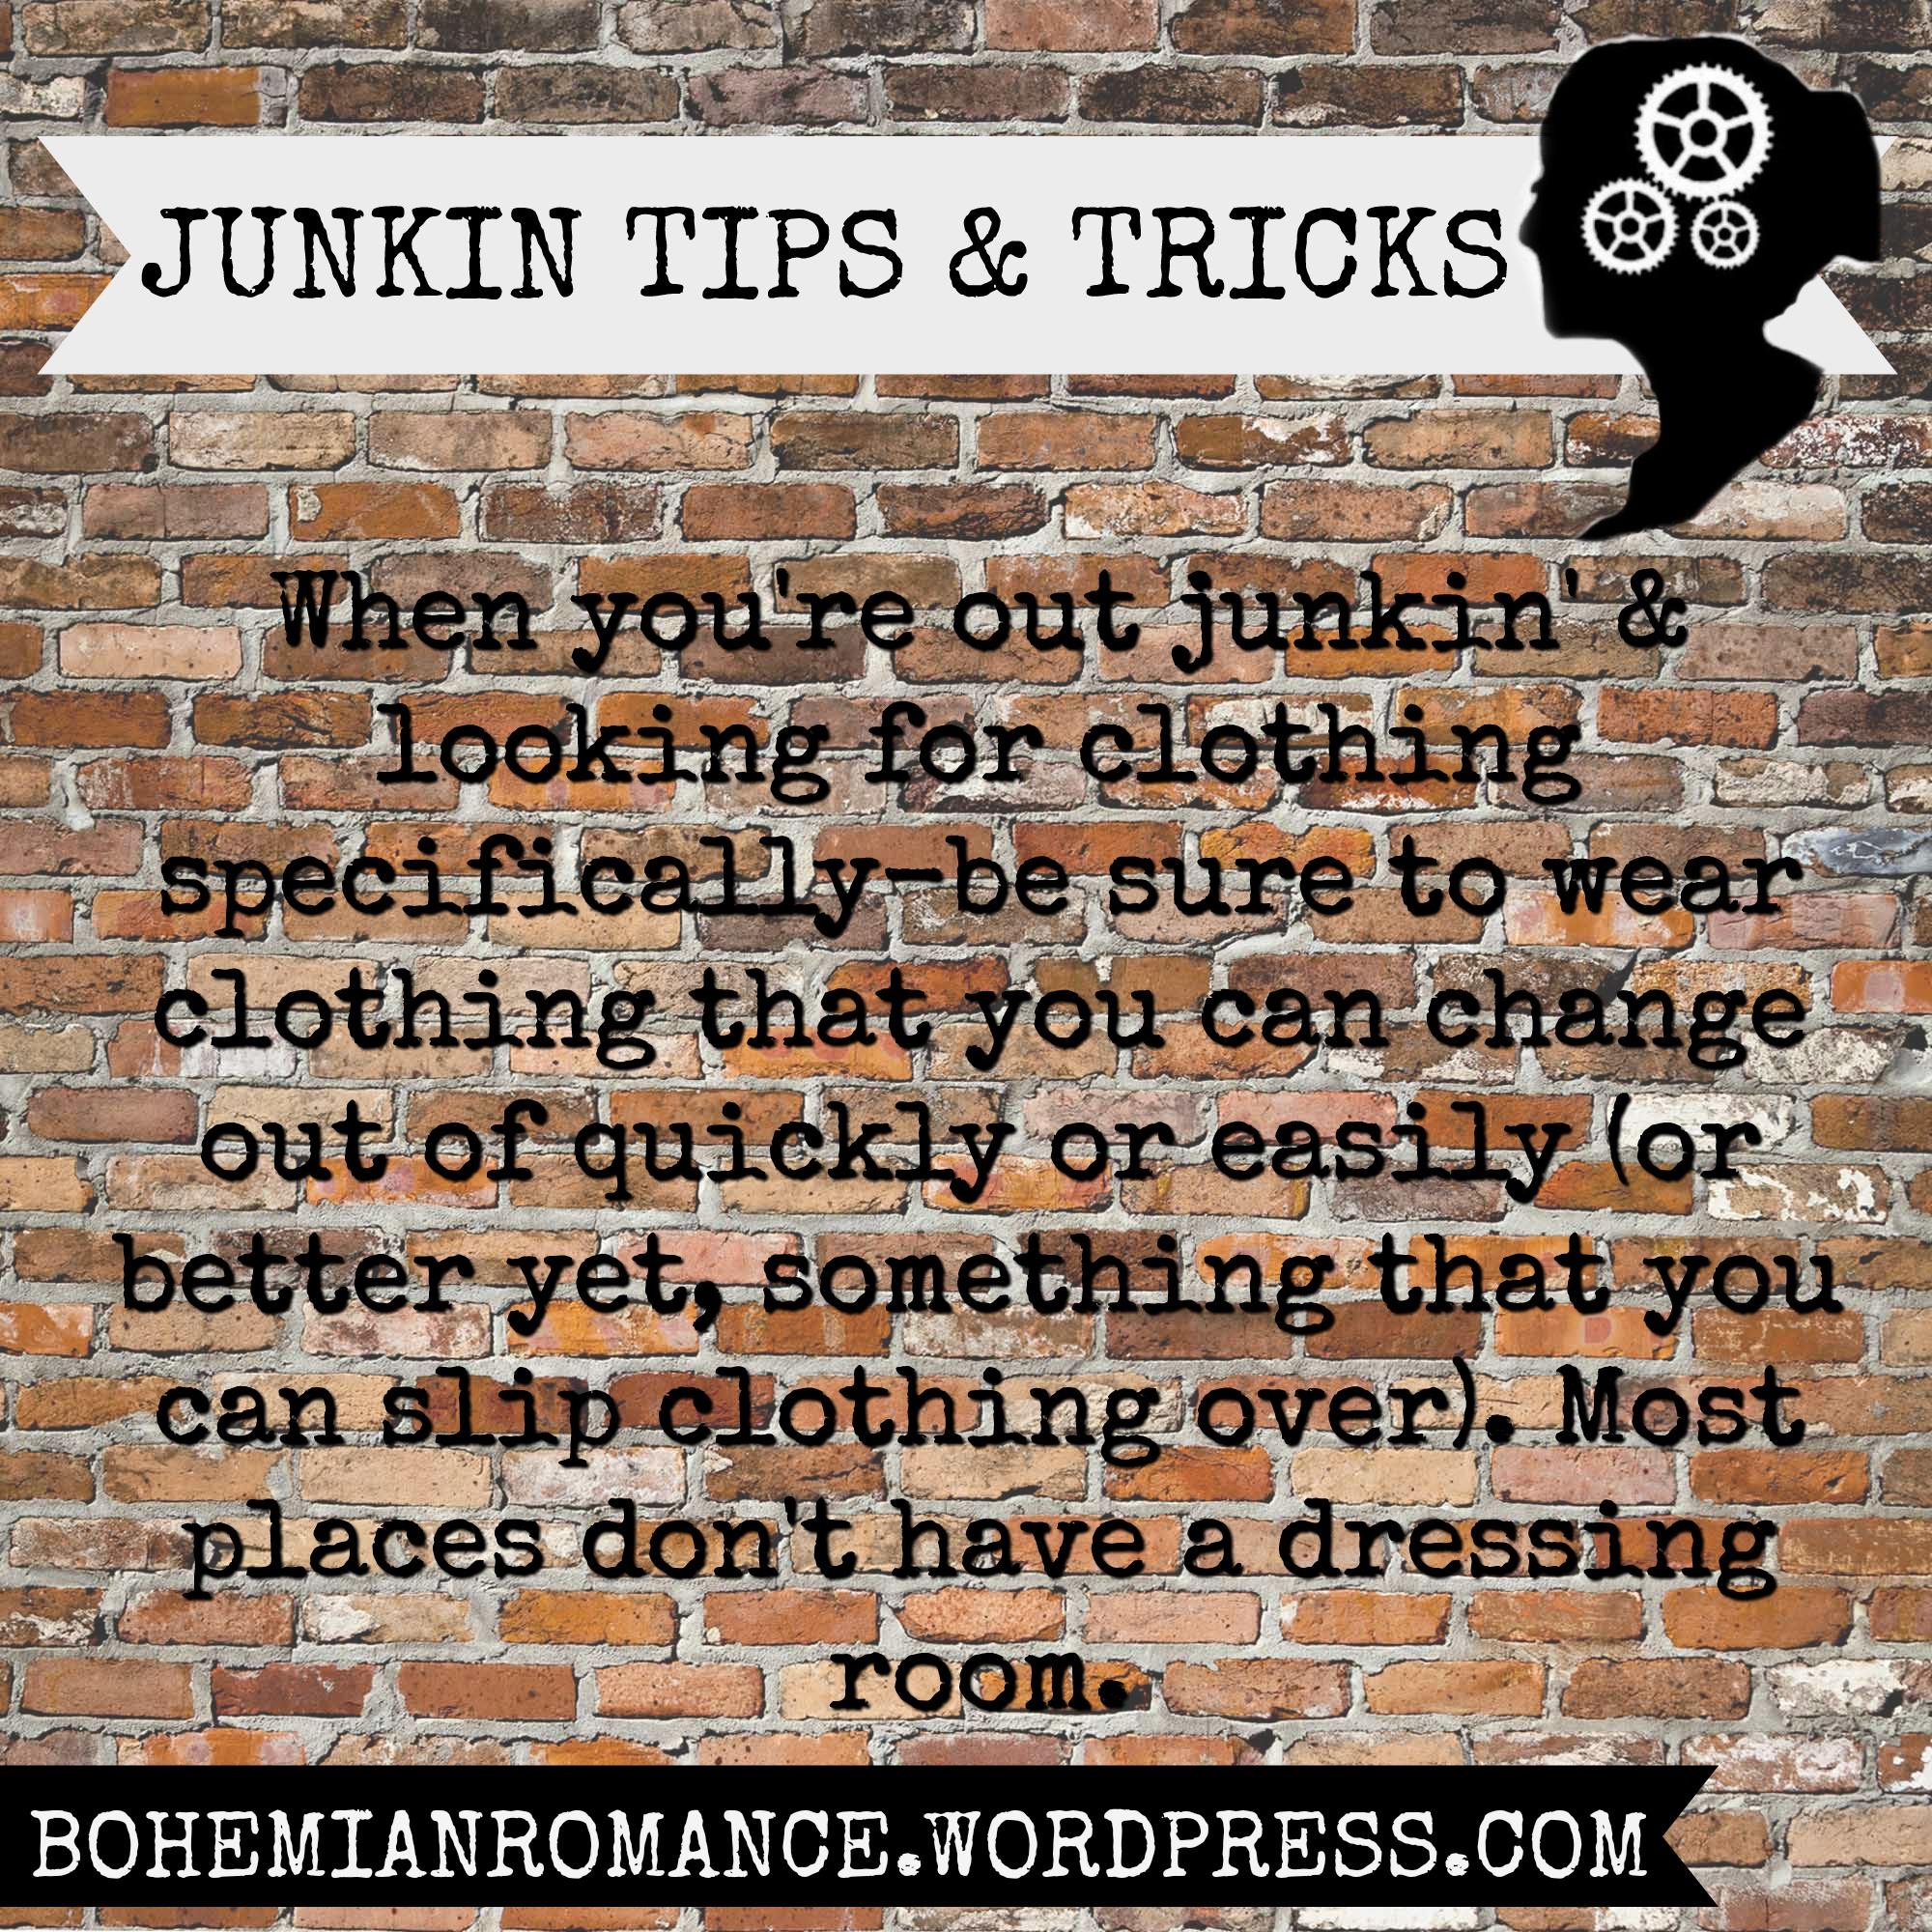 39-junkin-tips-tricks-template